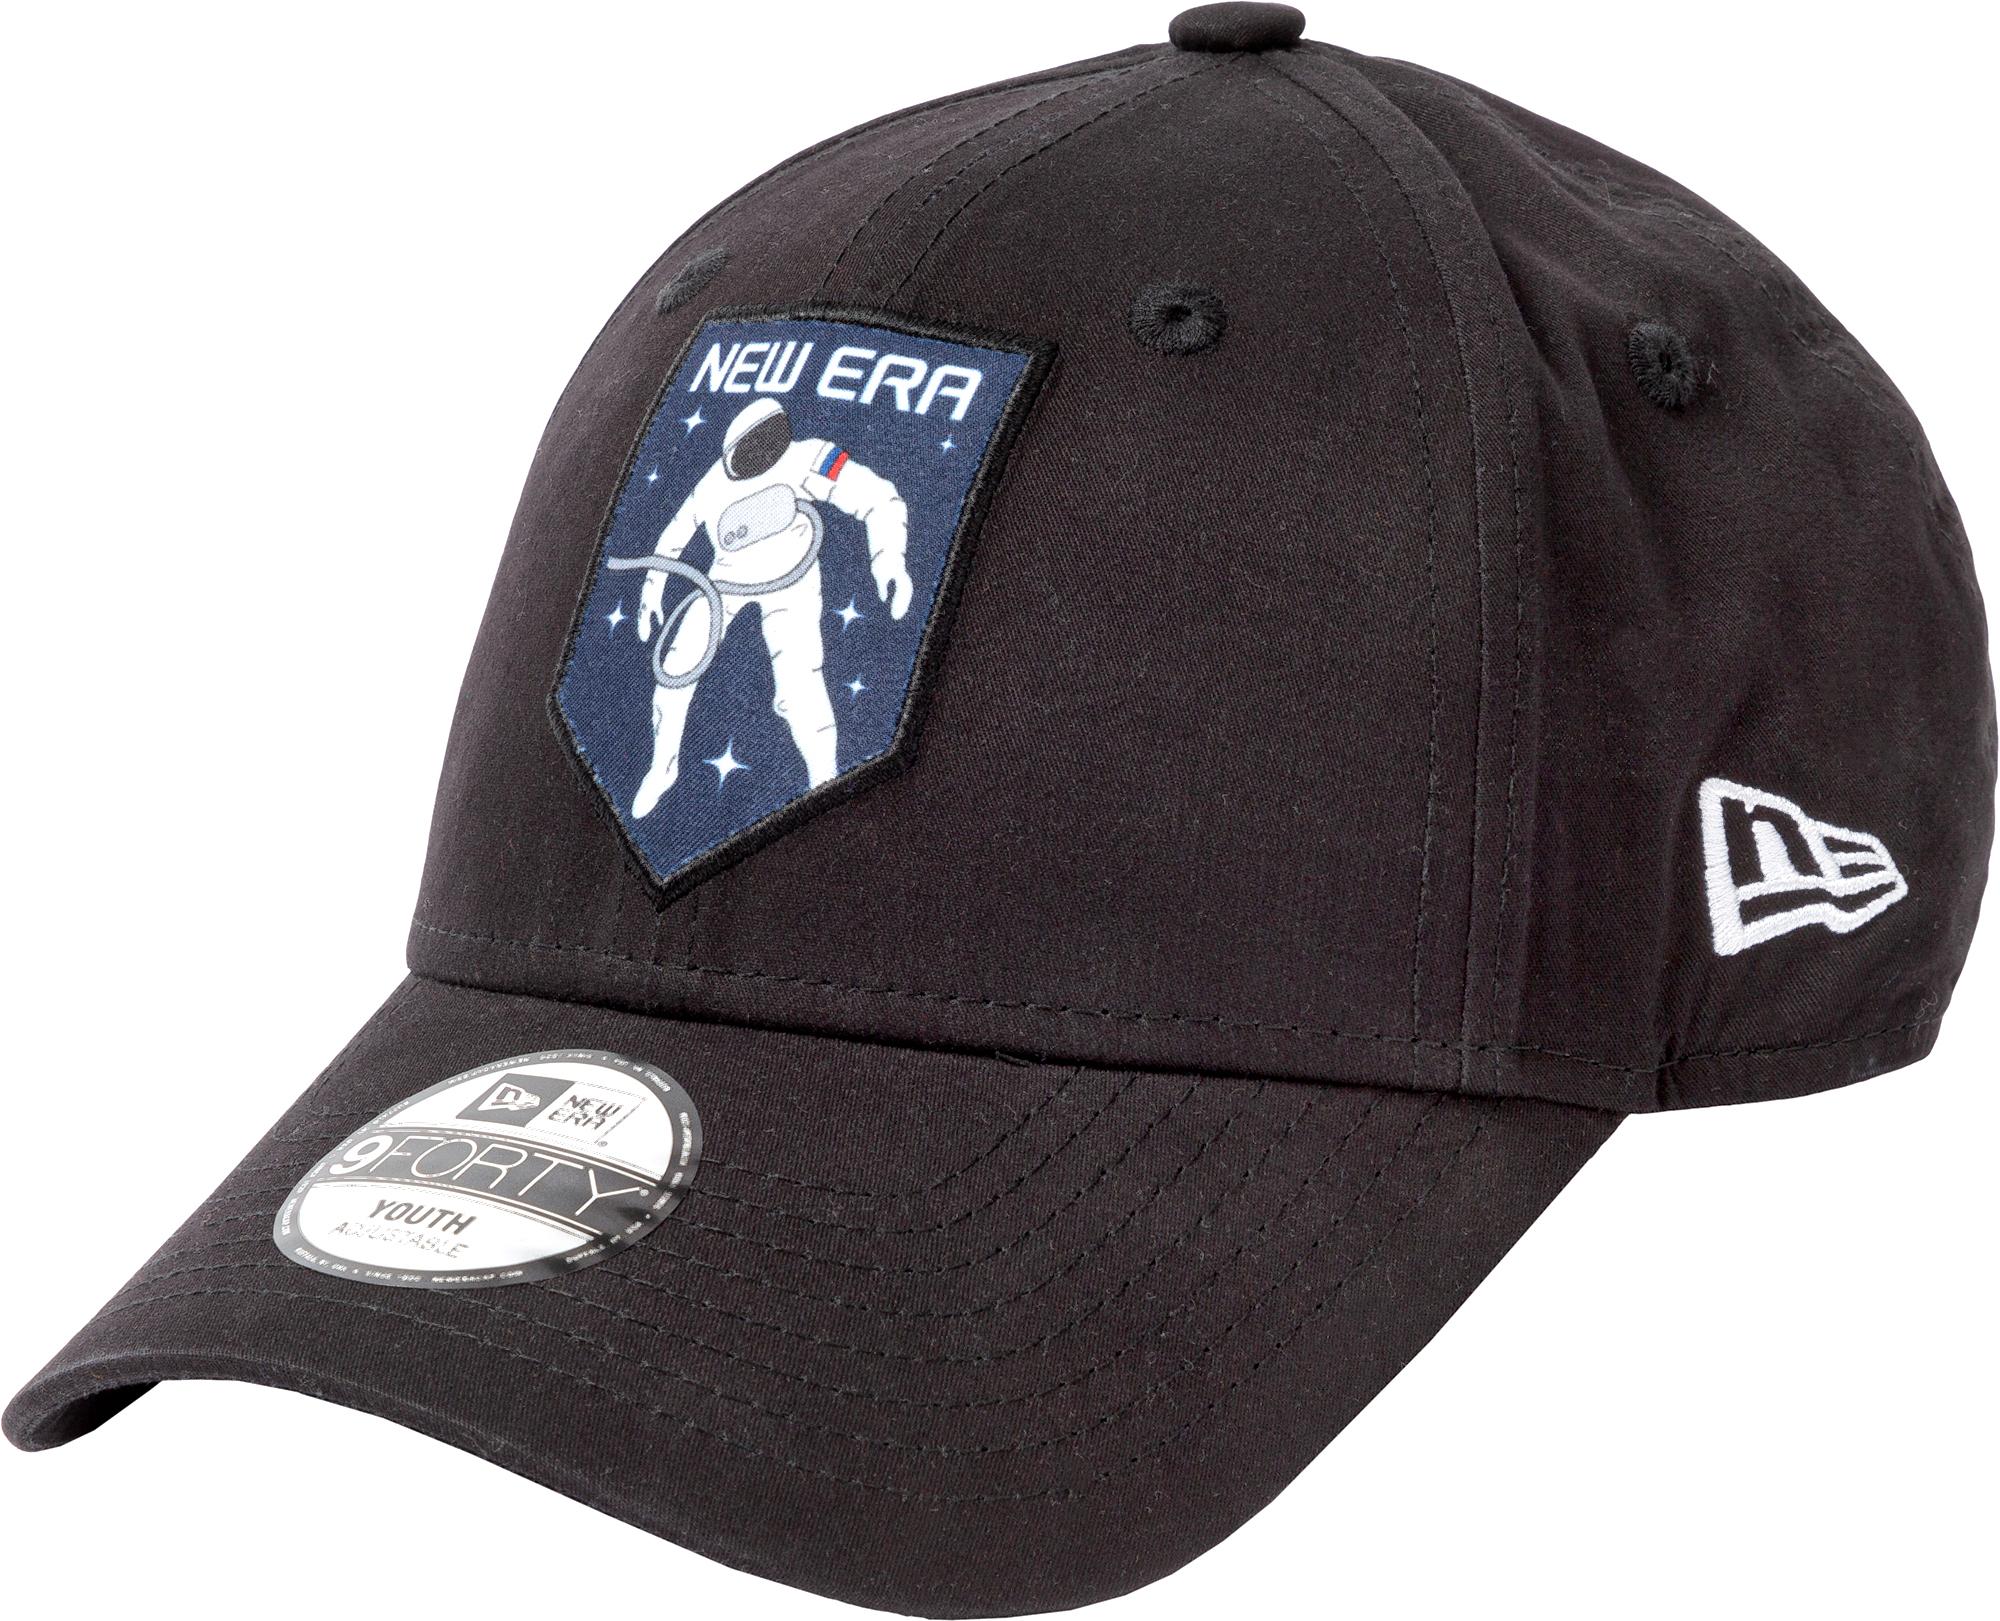 New Era Бейсболка для мальчиков New Era Space 940, размер 54-55 new era шапка для мальчиков new era ne cuff pom размер 54 55